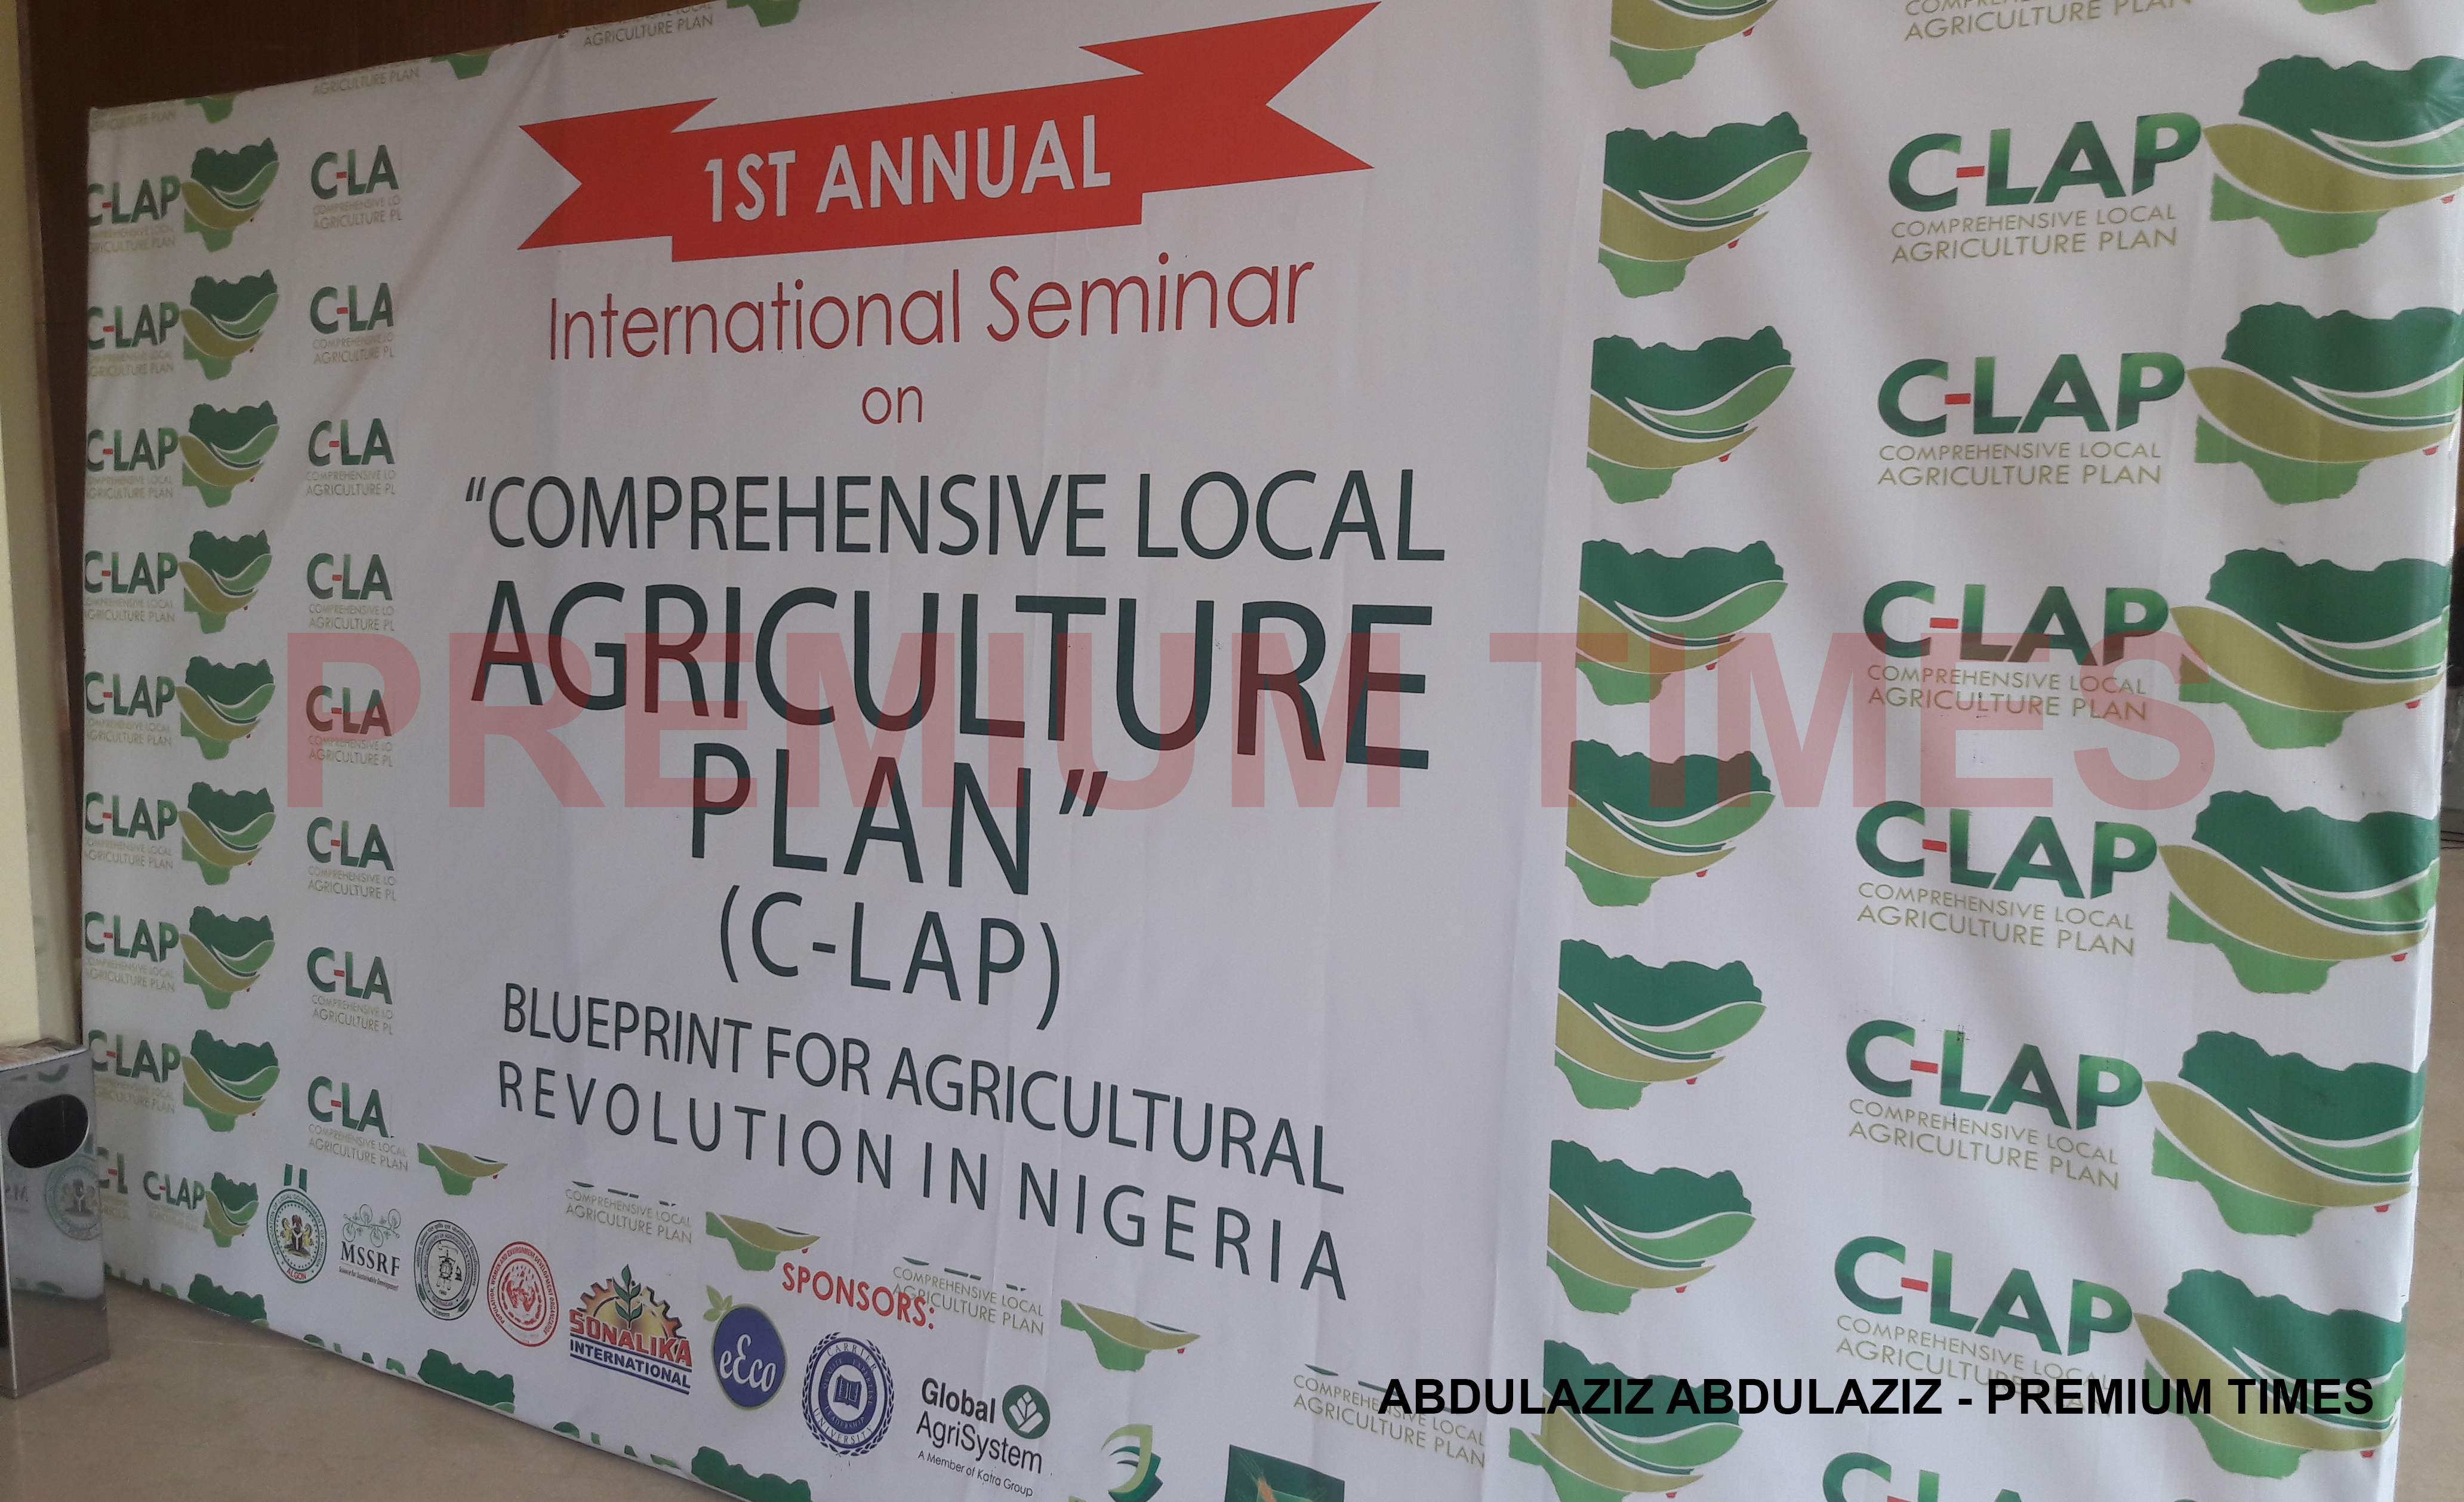 Live update international seminar on comprehensive local live update international seminar on comprehensive local agriculture plan c lap premium times nigeria malvernweather Images